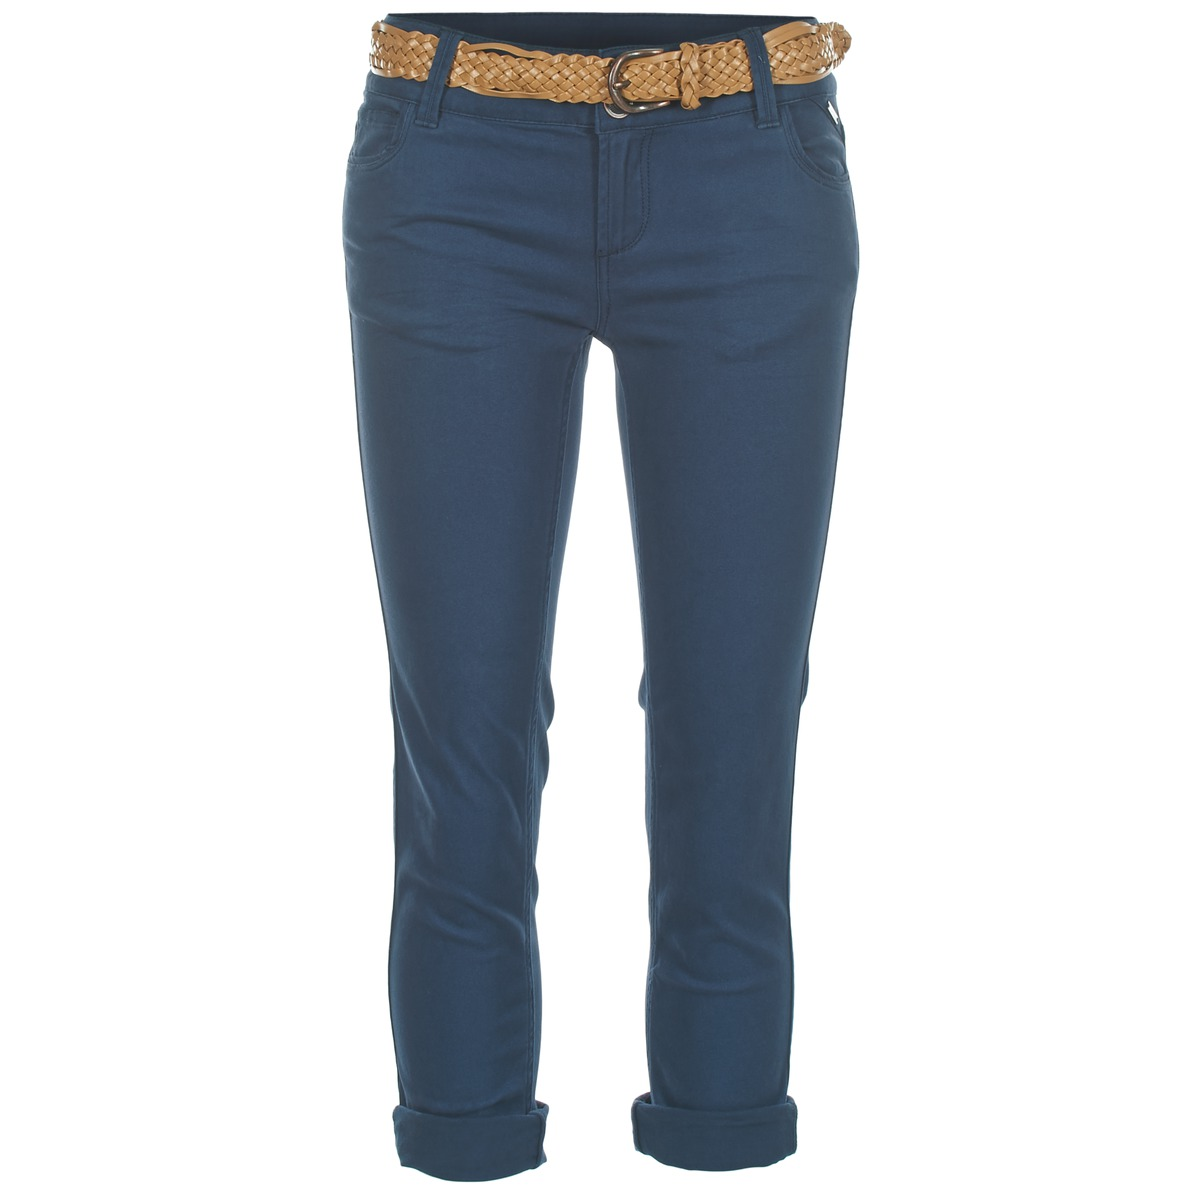 Pantalons 7/8 et 3/4 Best Mountain COULTER Bleu